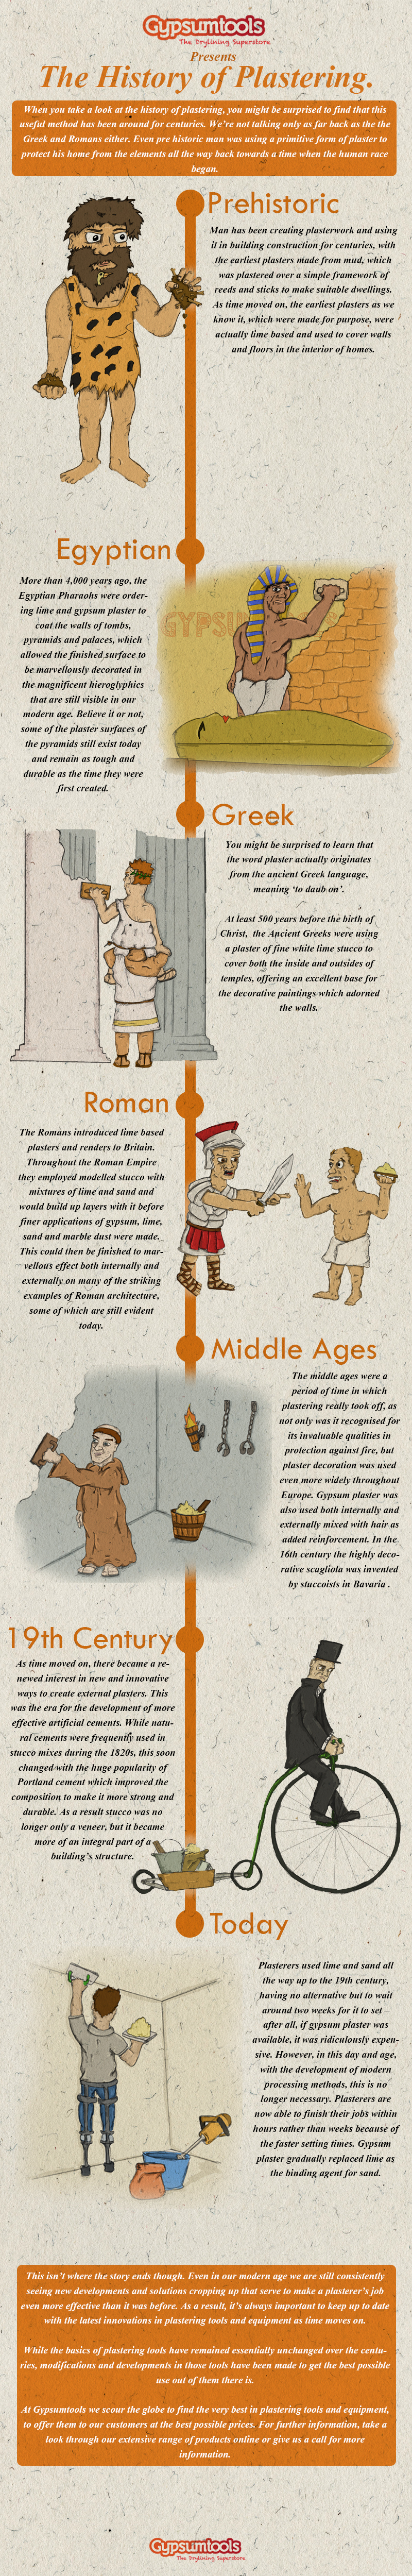 History of Plastering